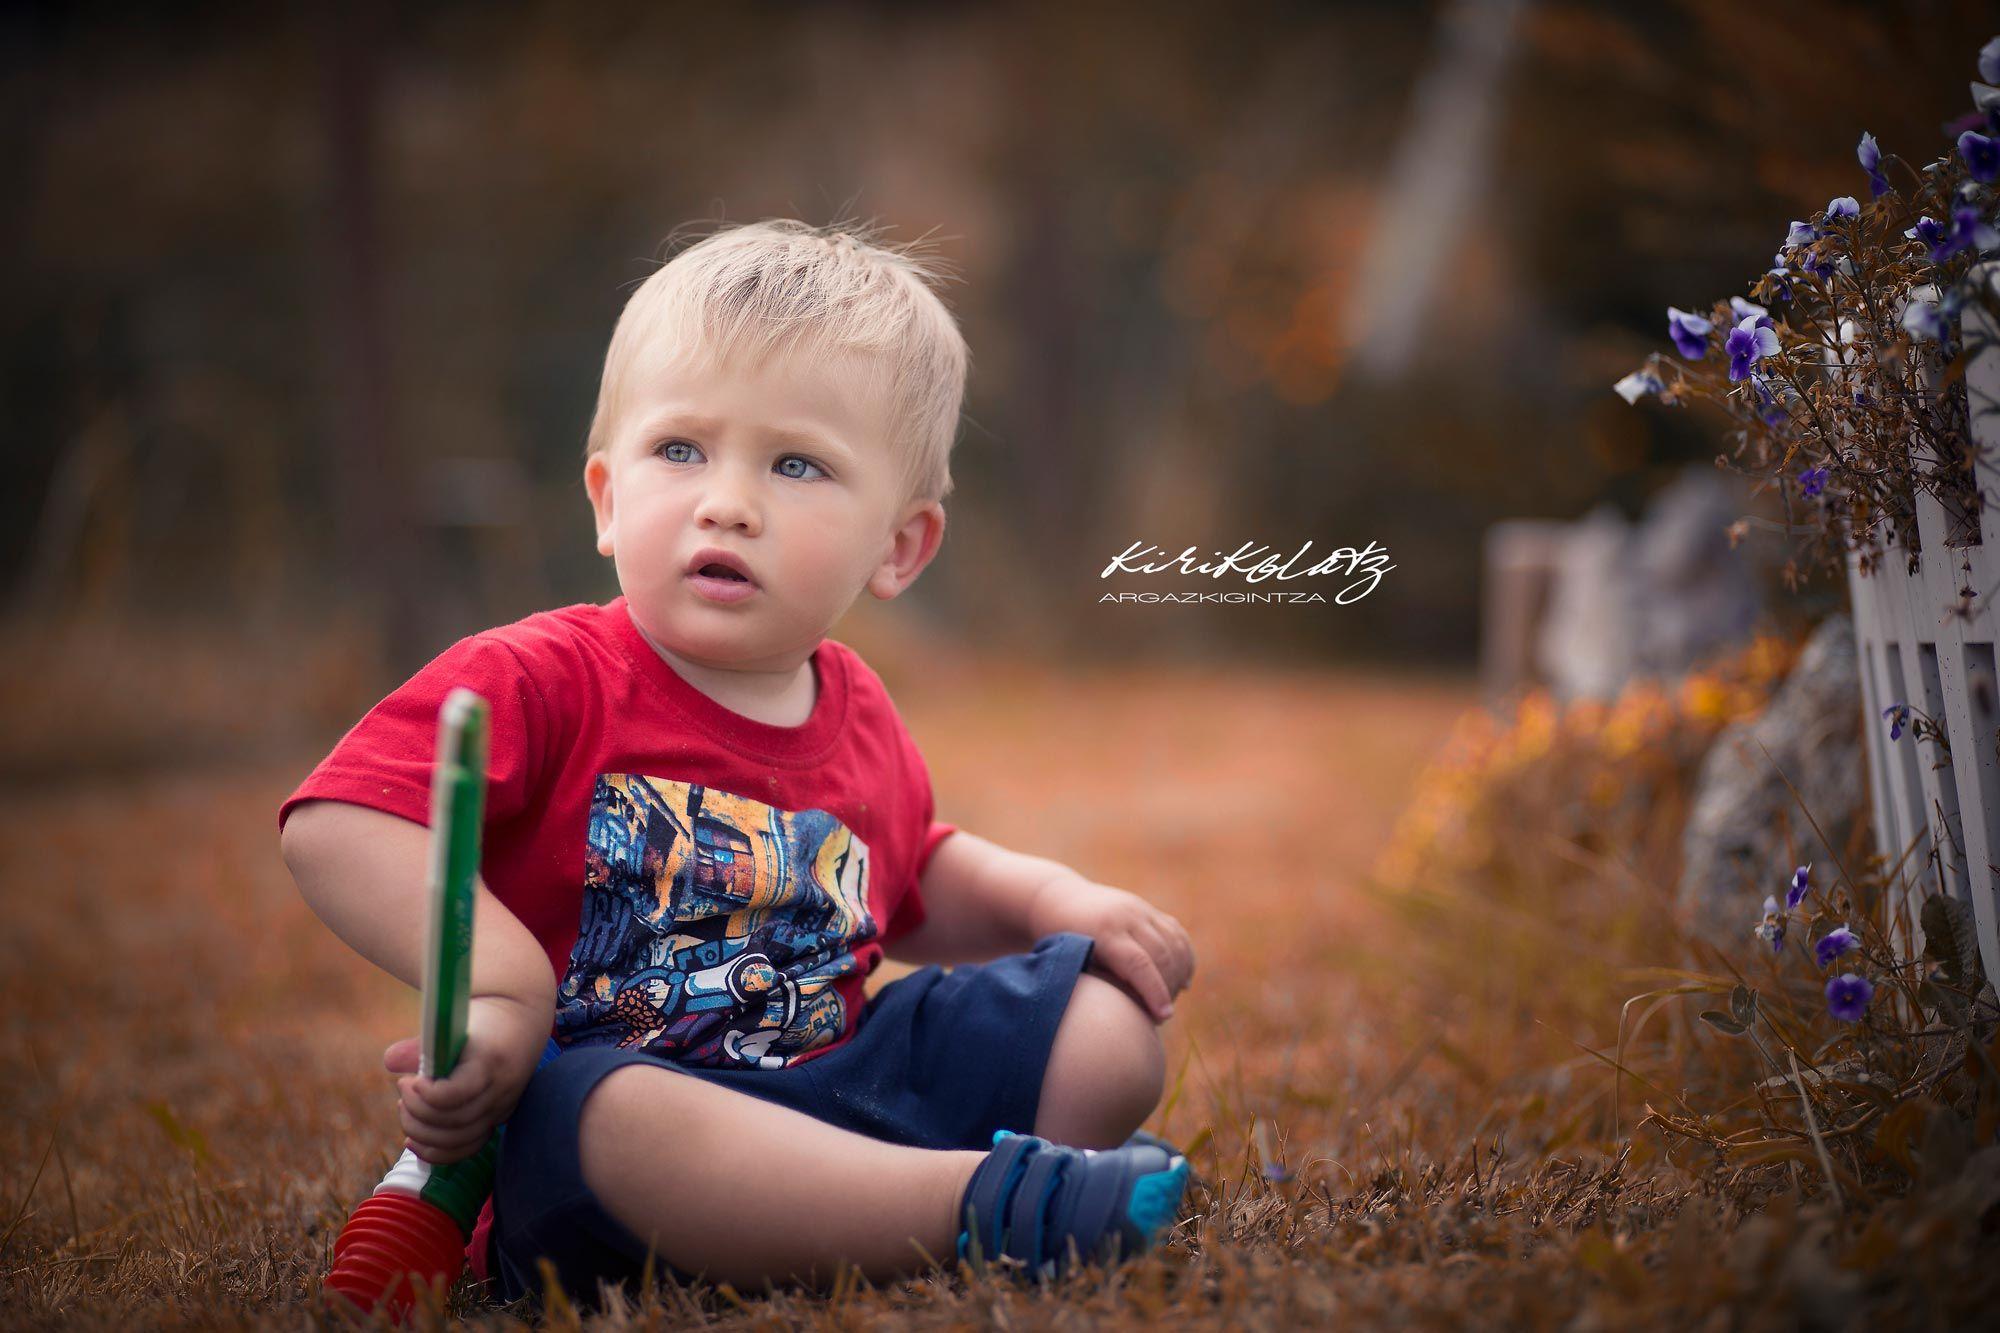 Fotografa Infantil Ninos Kirikolatz Bermeo